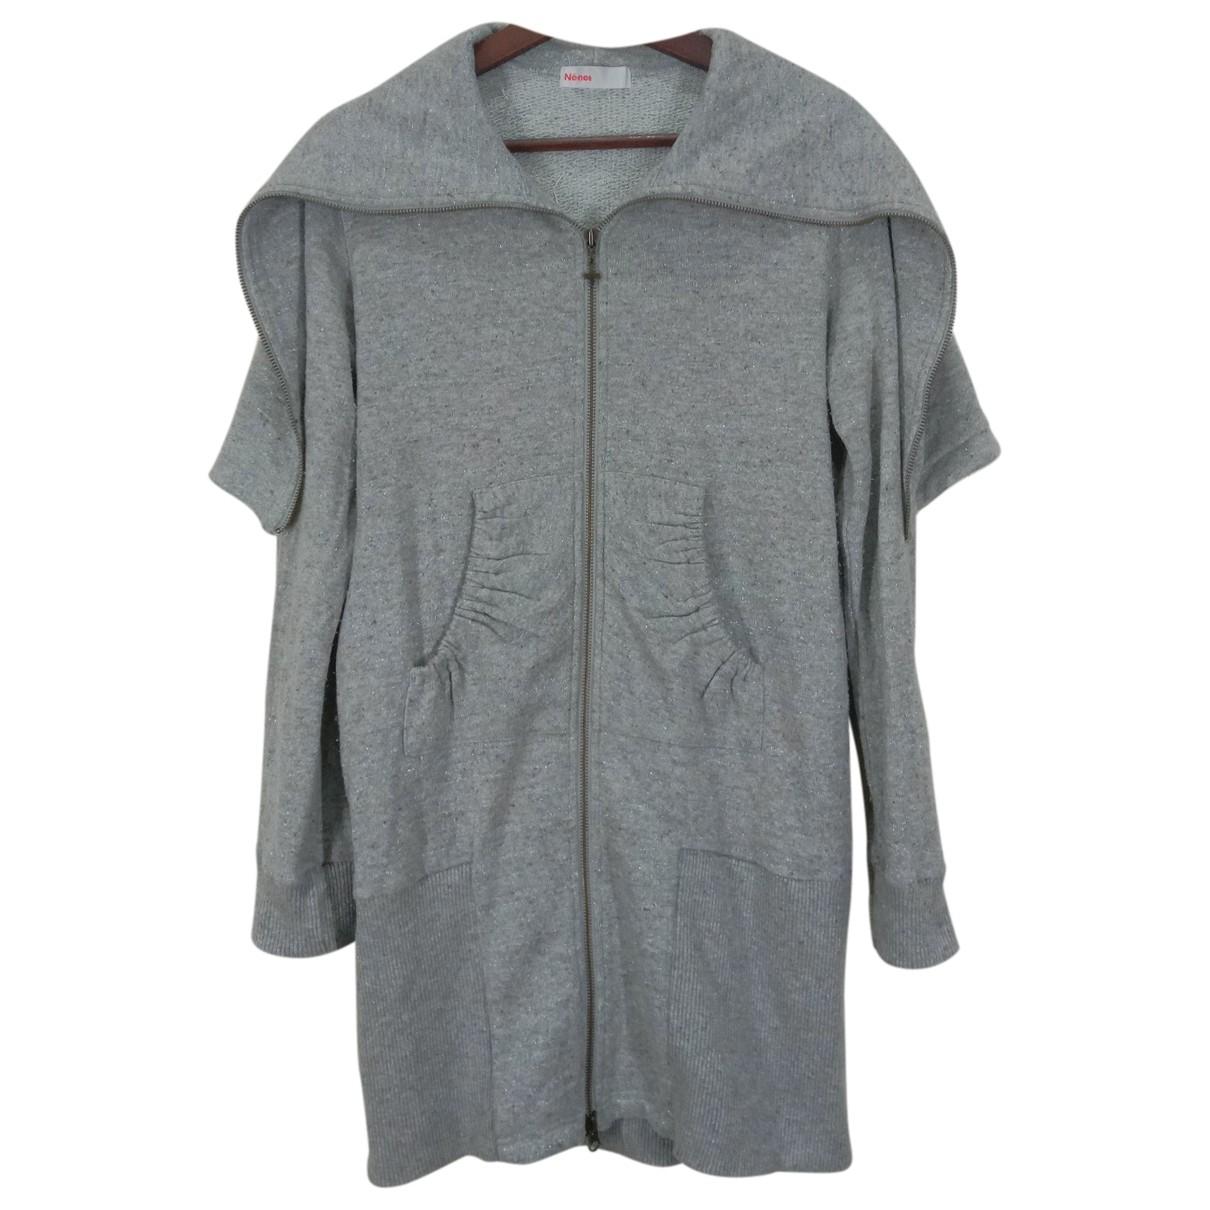 Né.net \N Grey Cotton jacket for Women 2 0-5